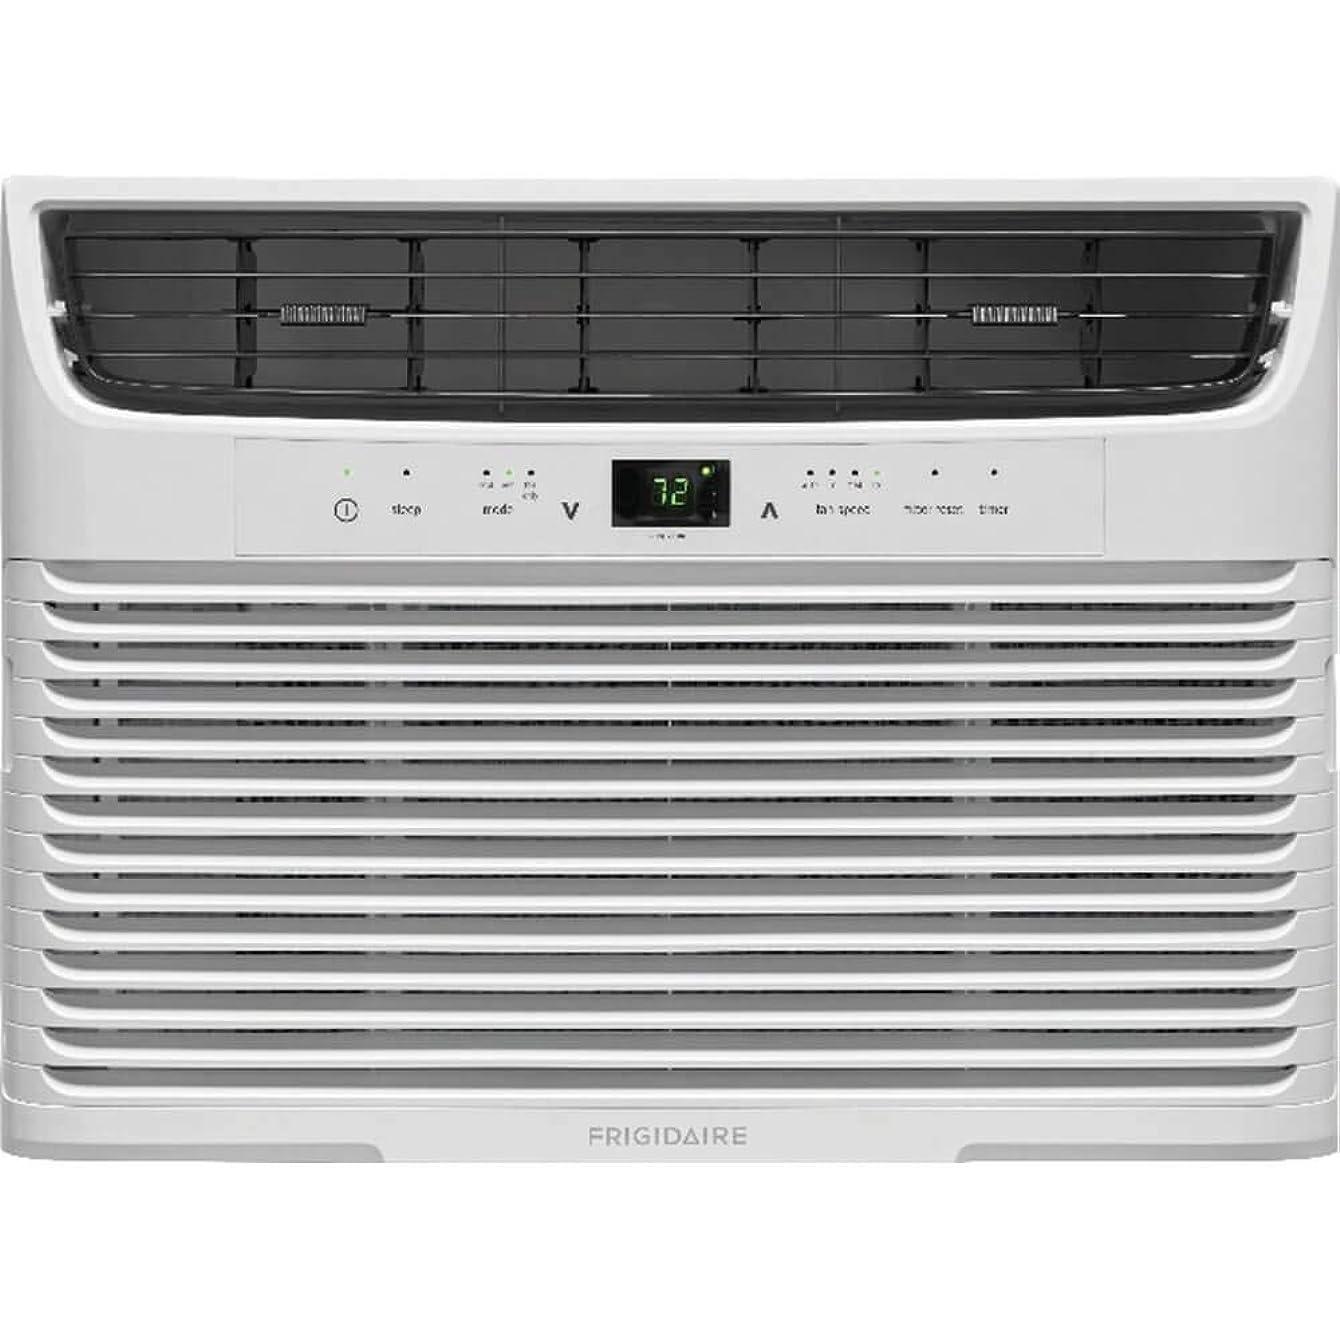 Frigidaire FFRA1222U1 Air Conditioner White